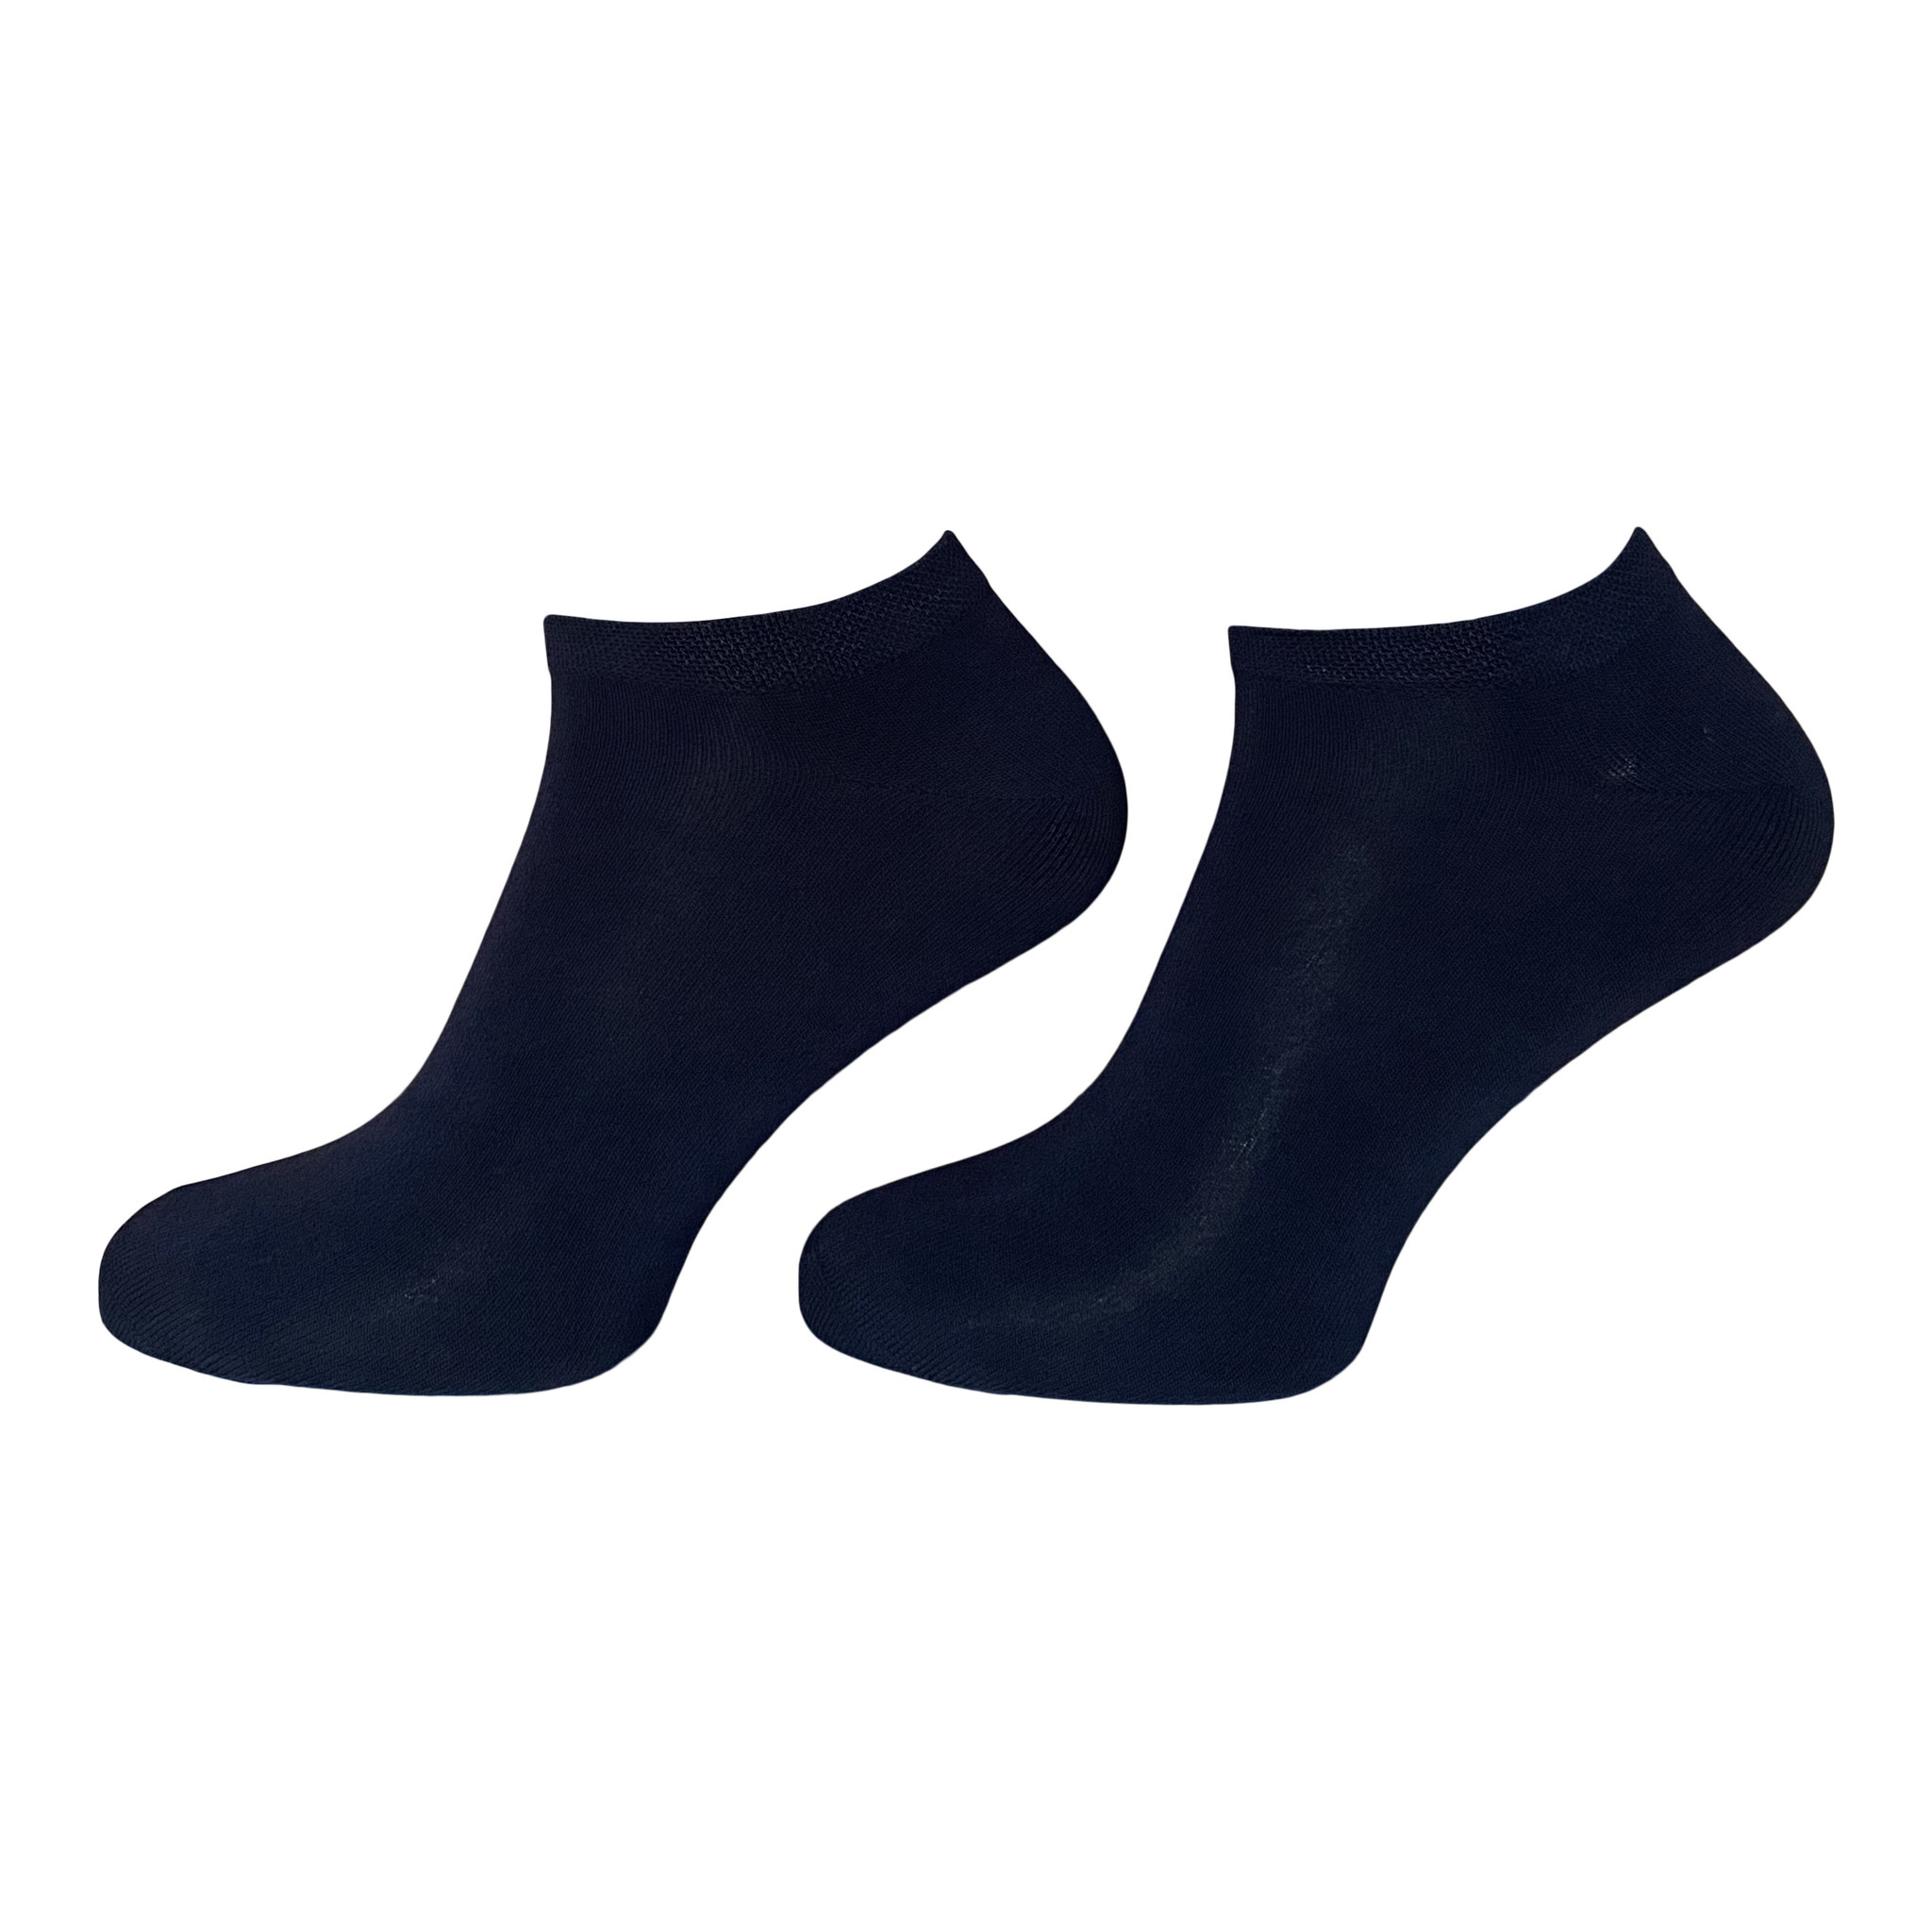 BORU Boru Bamboe sneaker sokken - marine